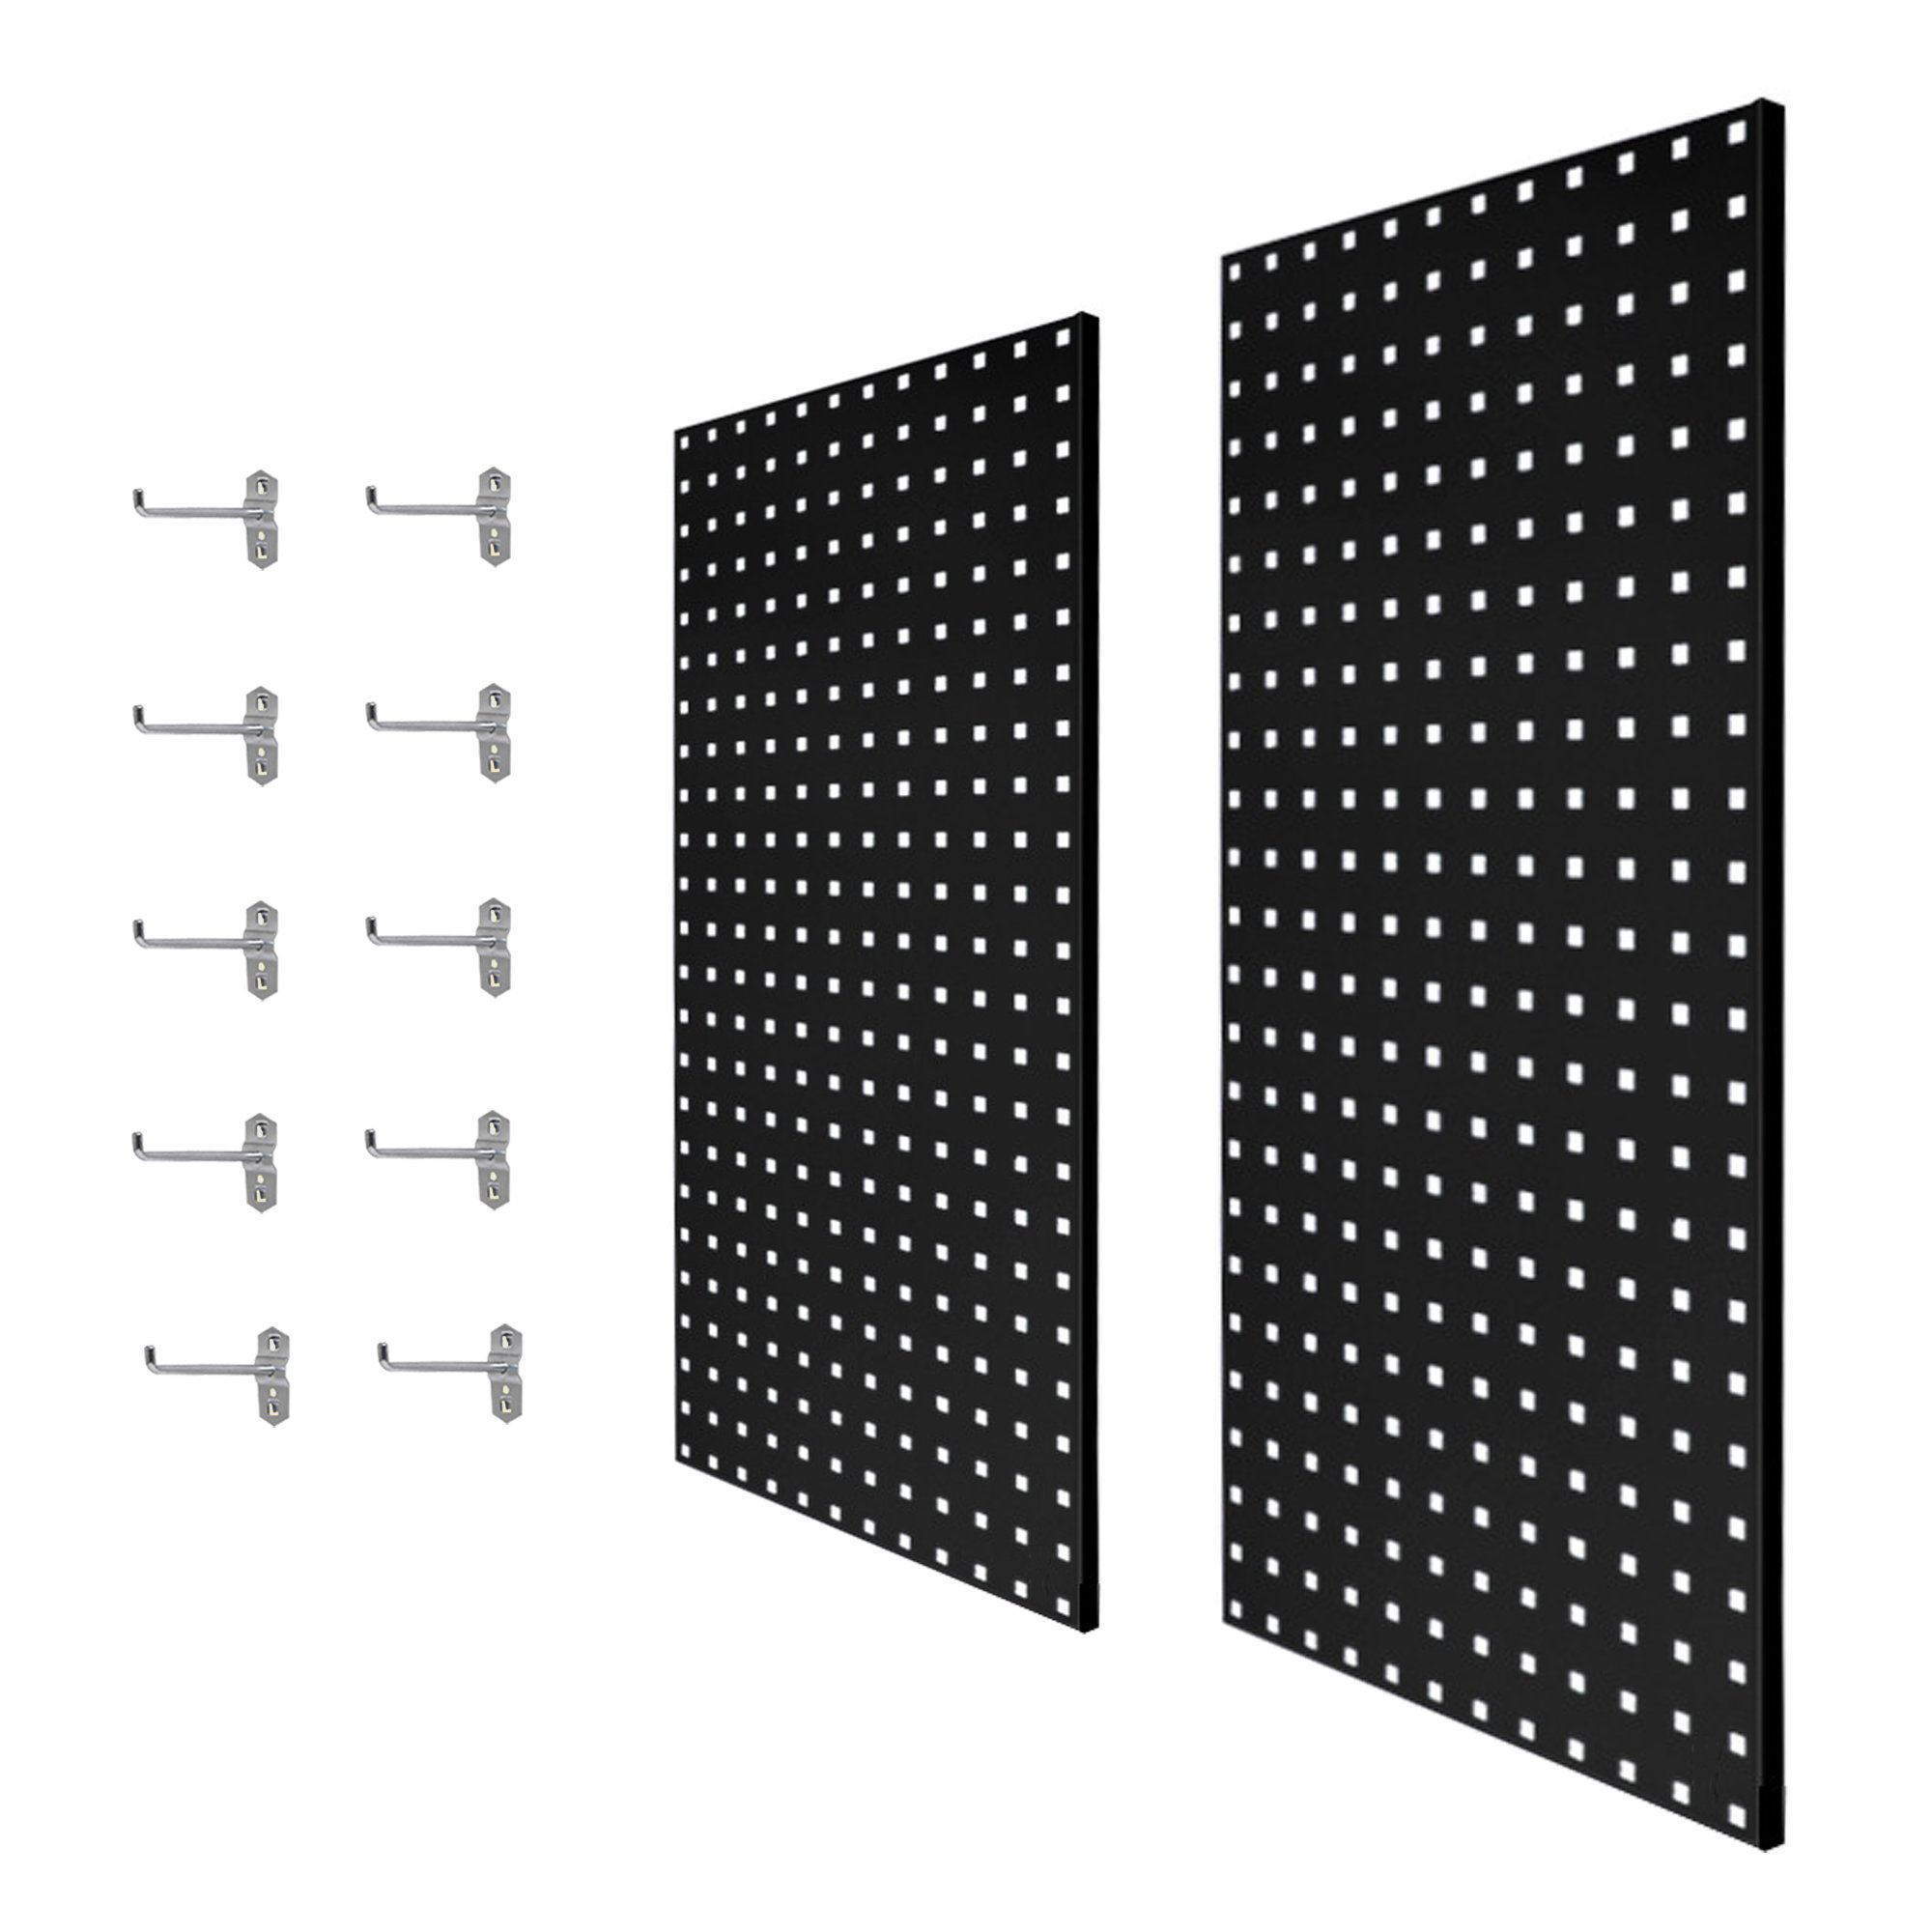 2Pcs Large Wall Mounted Steel Pegboard Panels & 10 Hooks Set